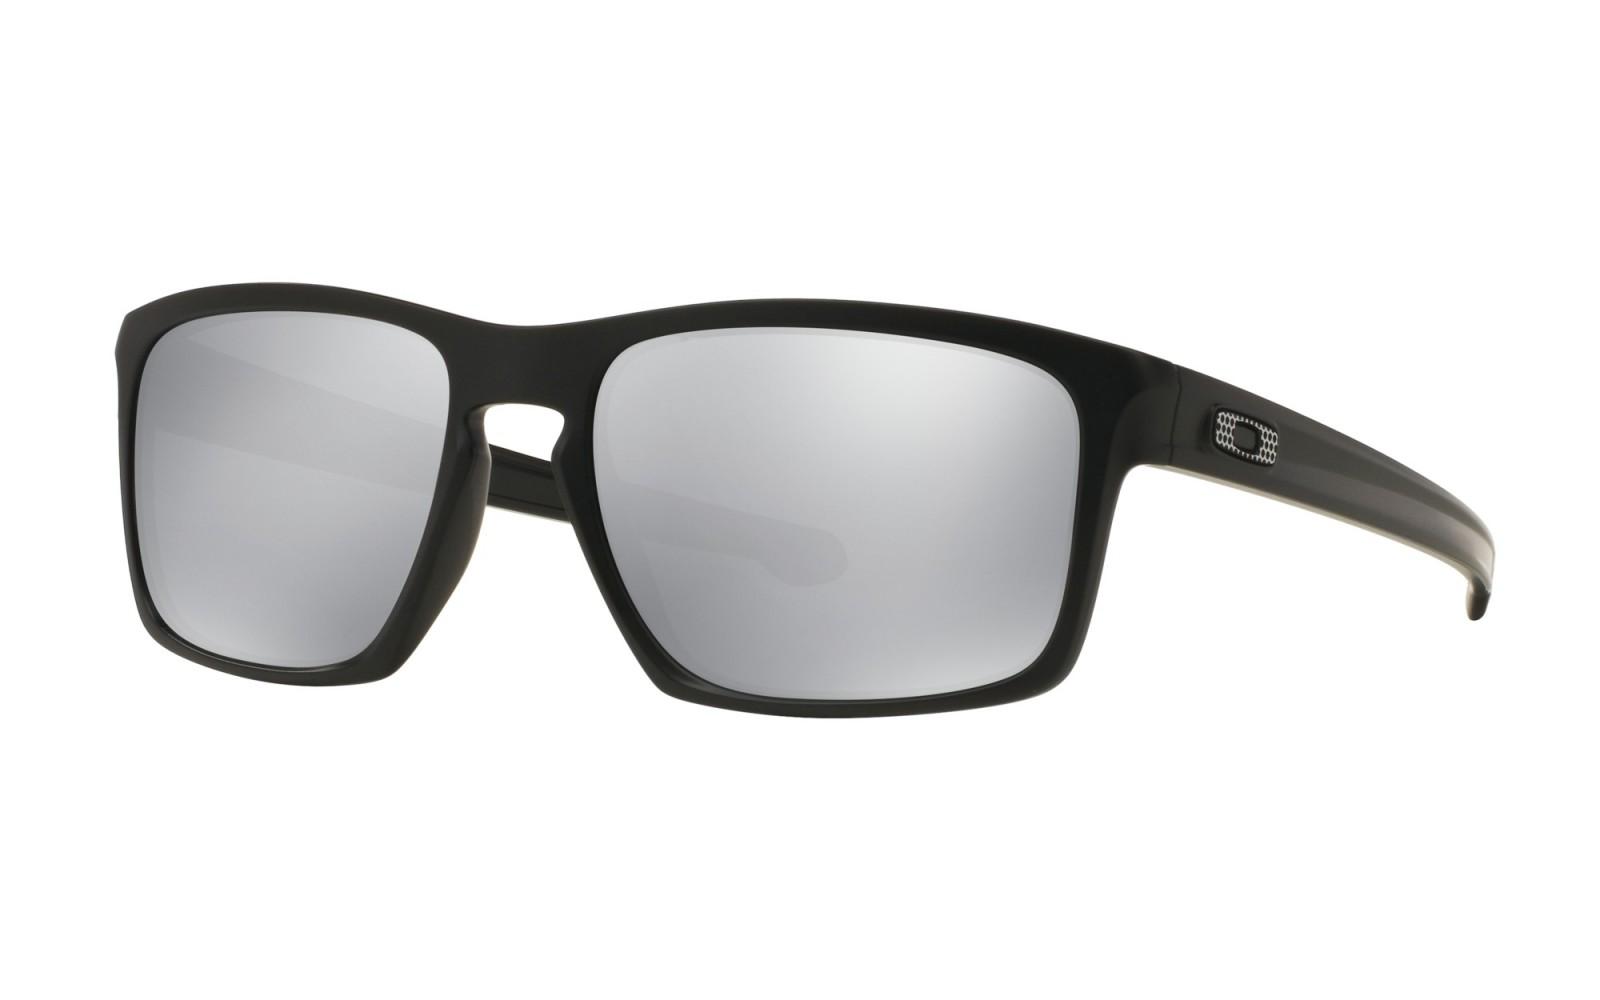 Oakley Sliver Machinist Collection - Matte Black / Chrome Iridium - OO9262-26 Zonnebril